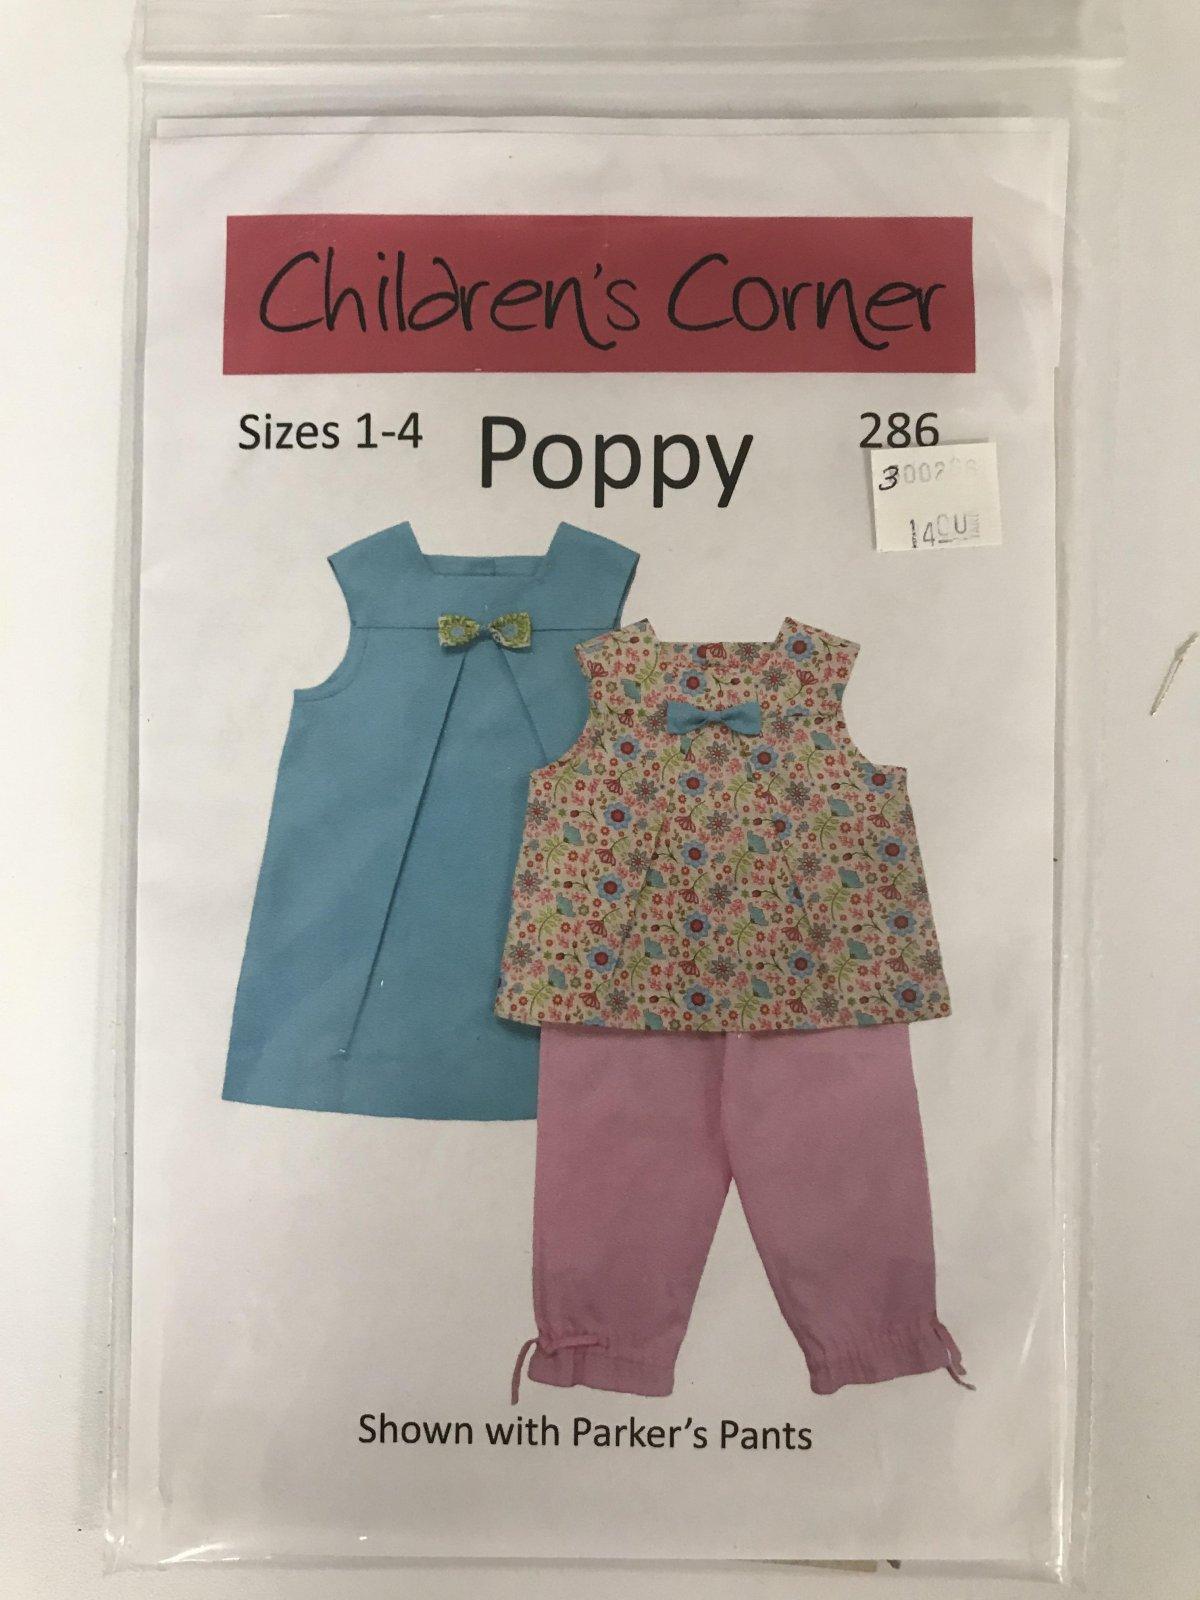 CHILDREN'S CORNER POPPY